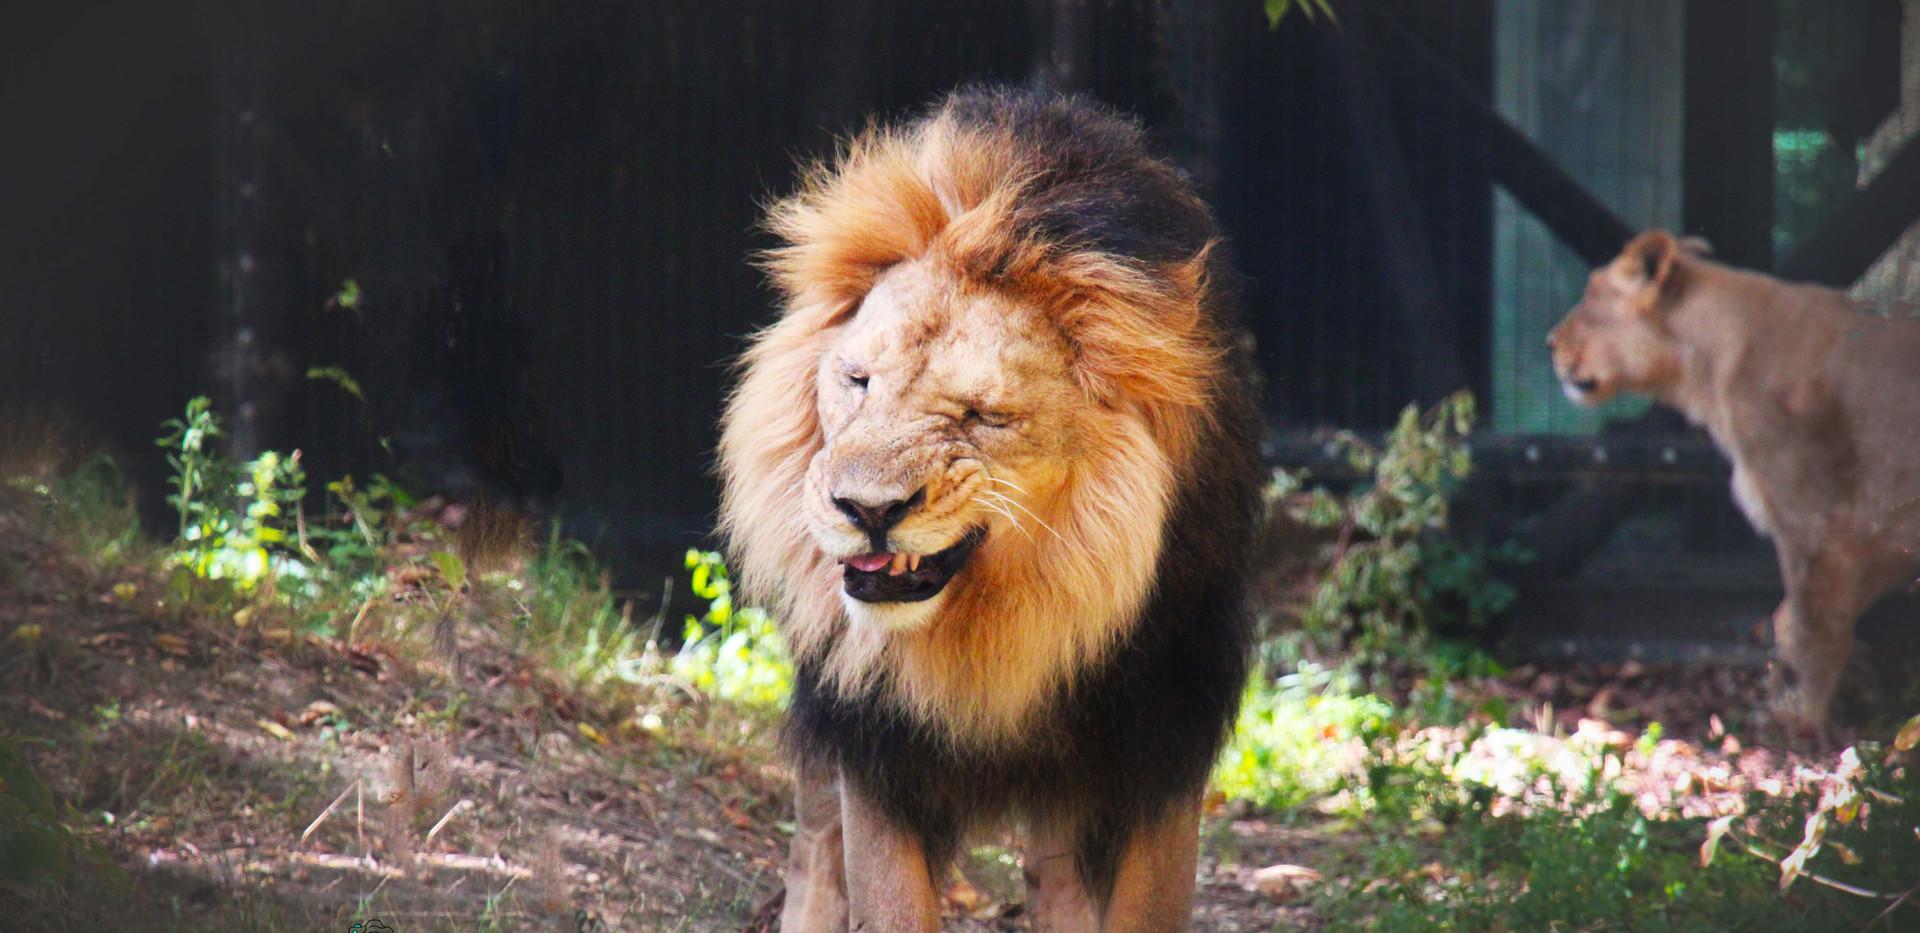 Bhanu the Lion sneezing